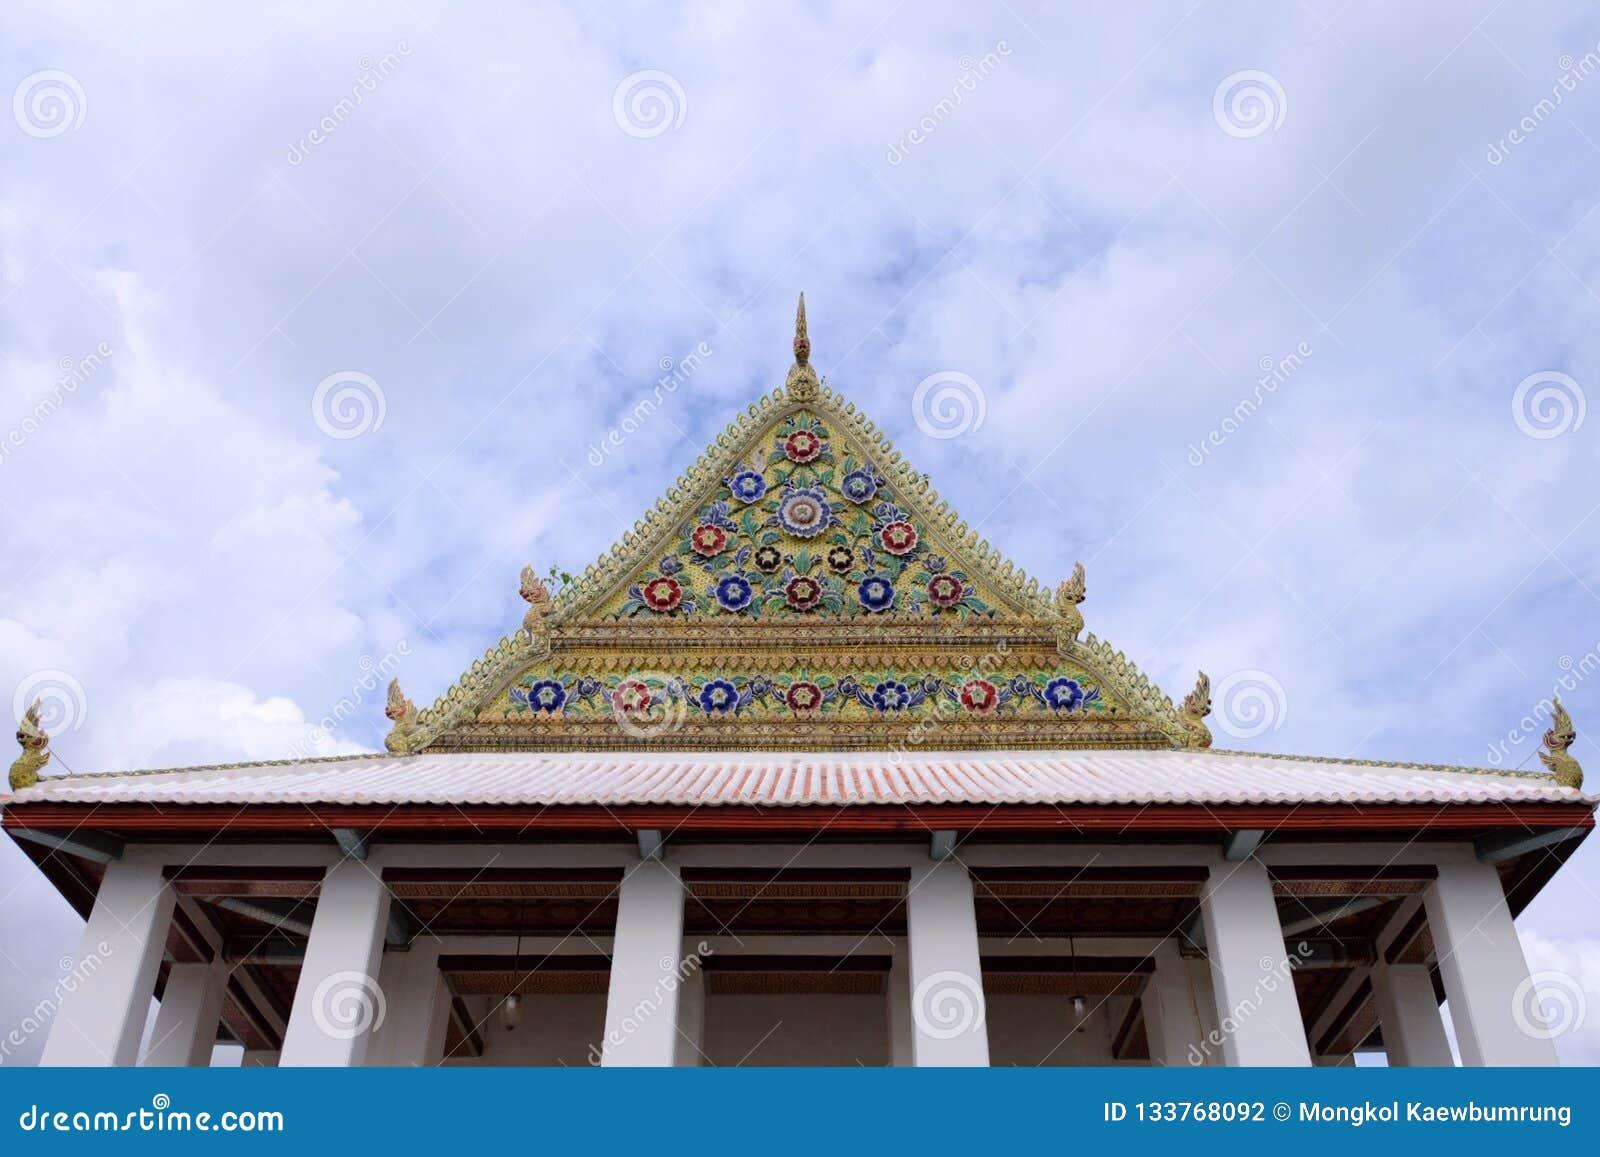 Timpano reale tailandese del santuario da Wat Chaloem Phra Kiat Worawihan